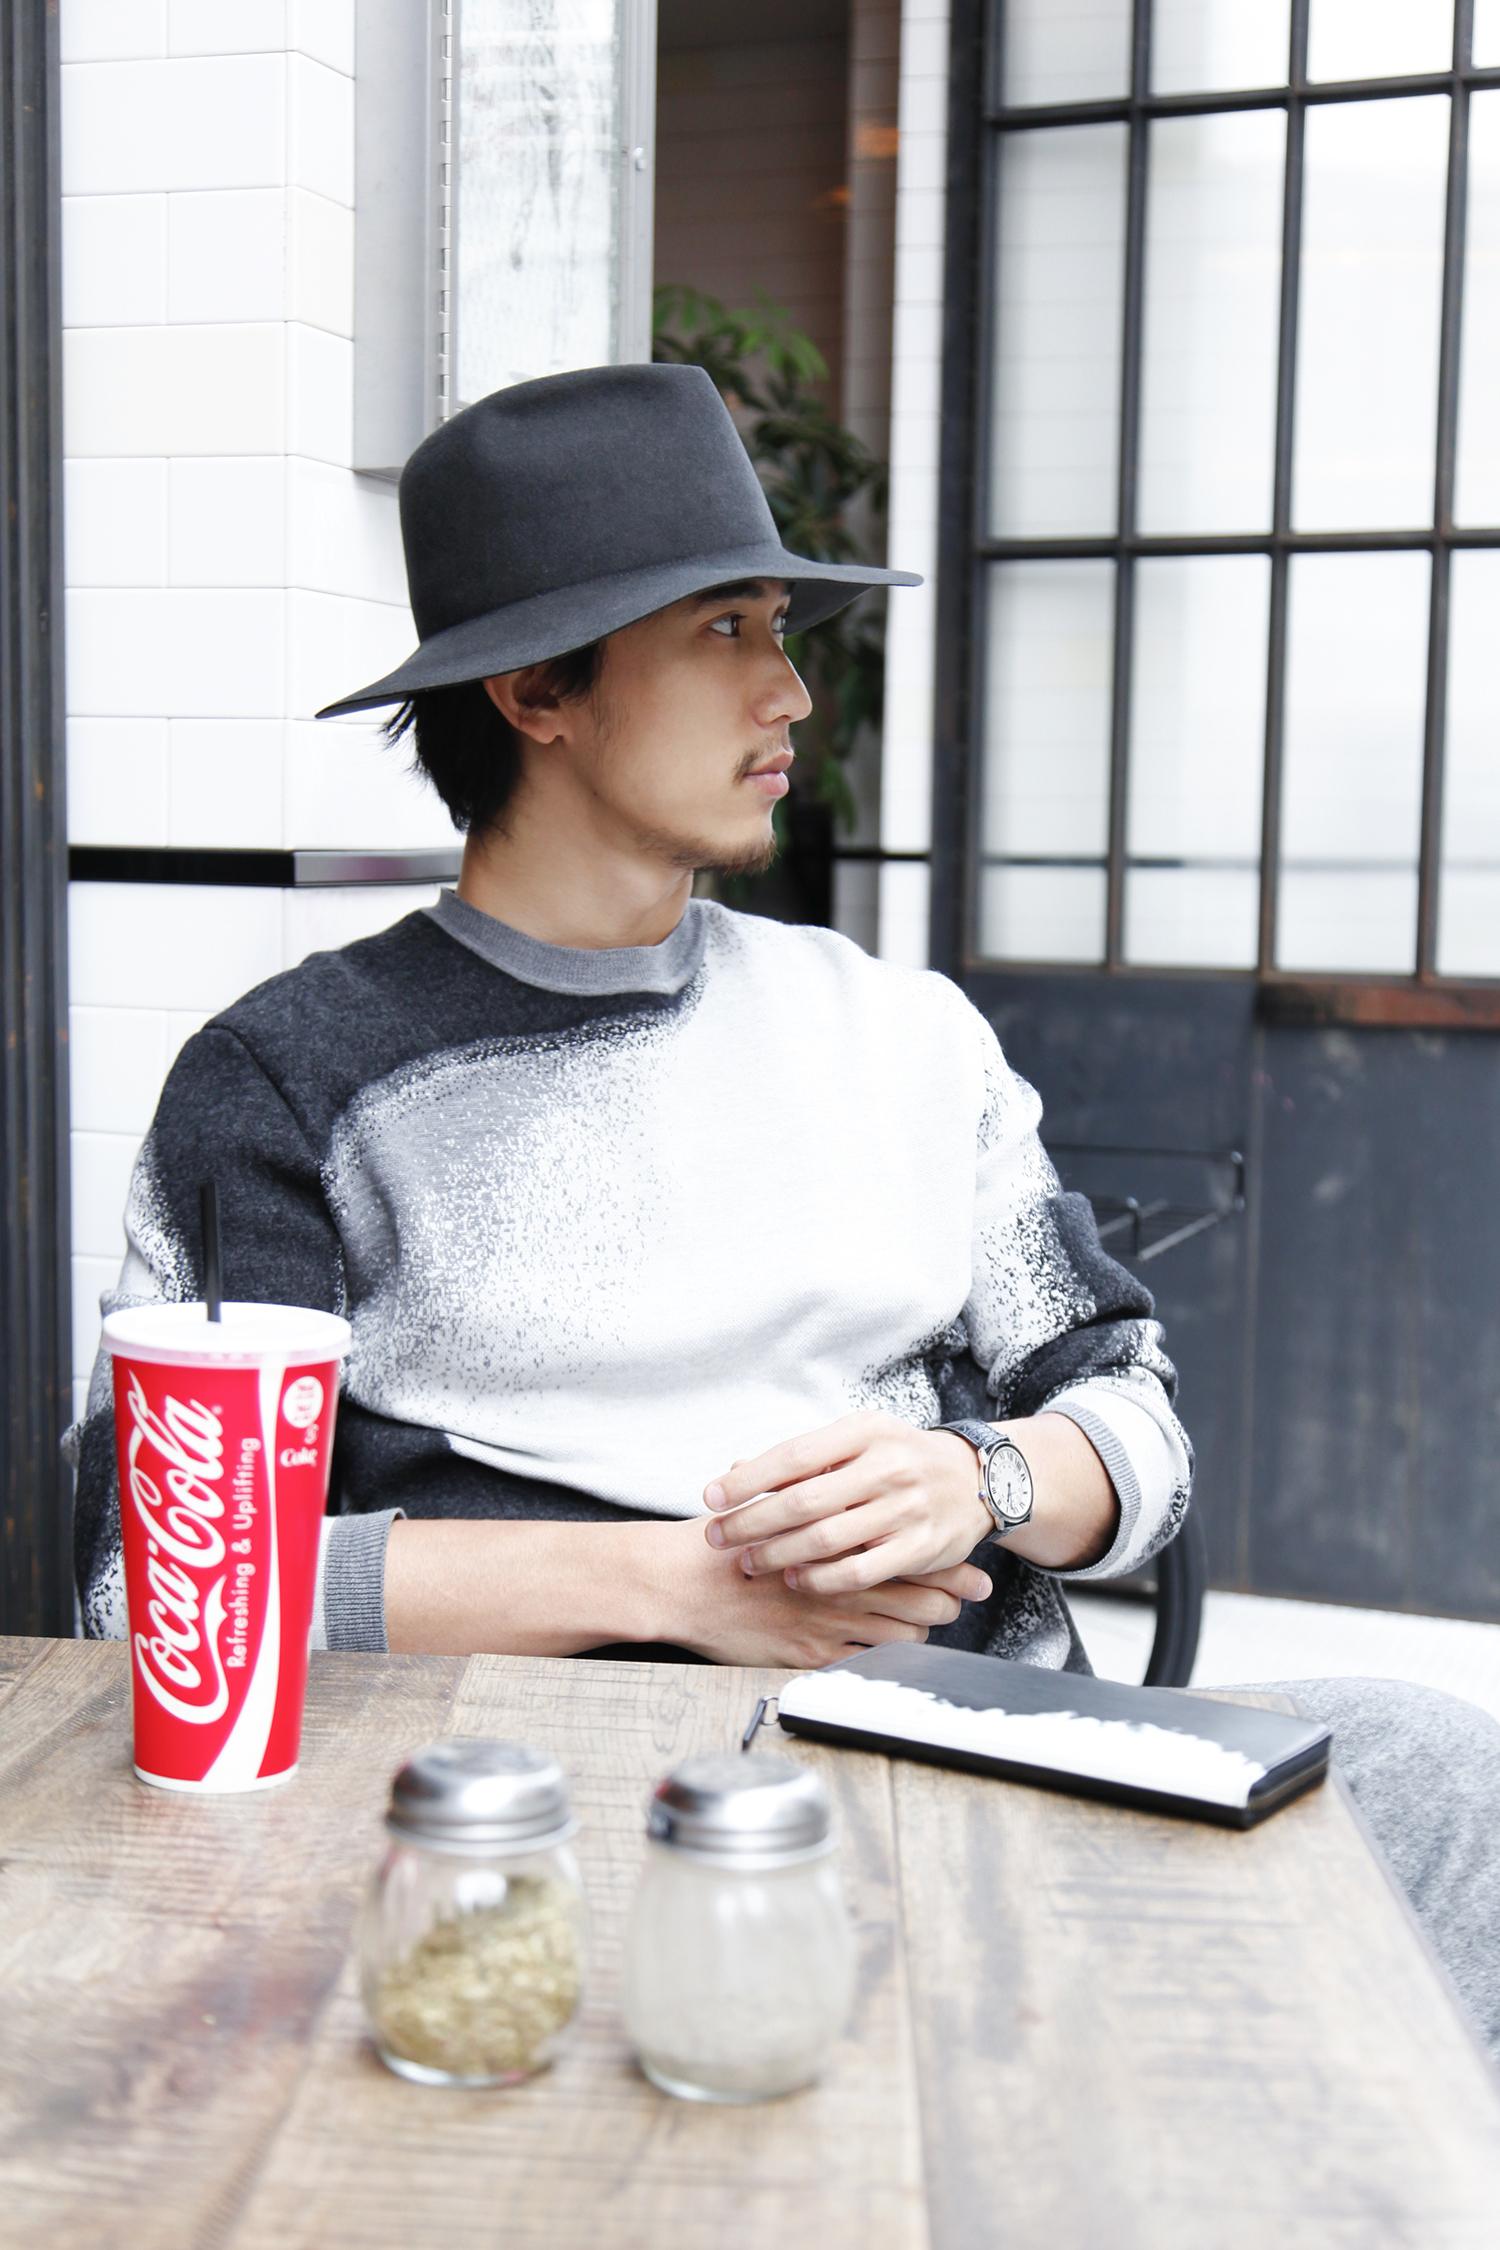 CK_Daichi Miura_2_